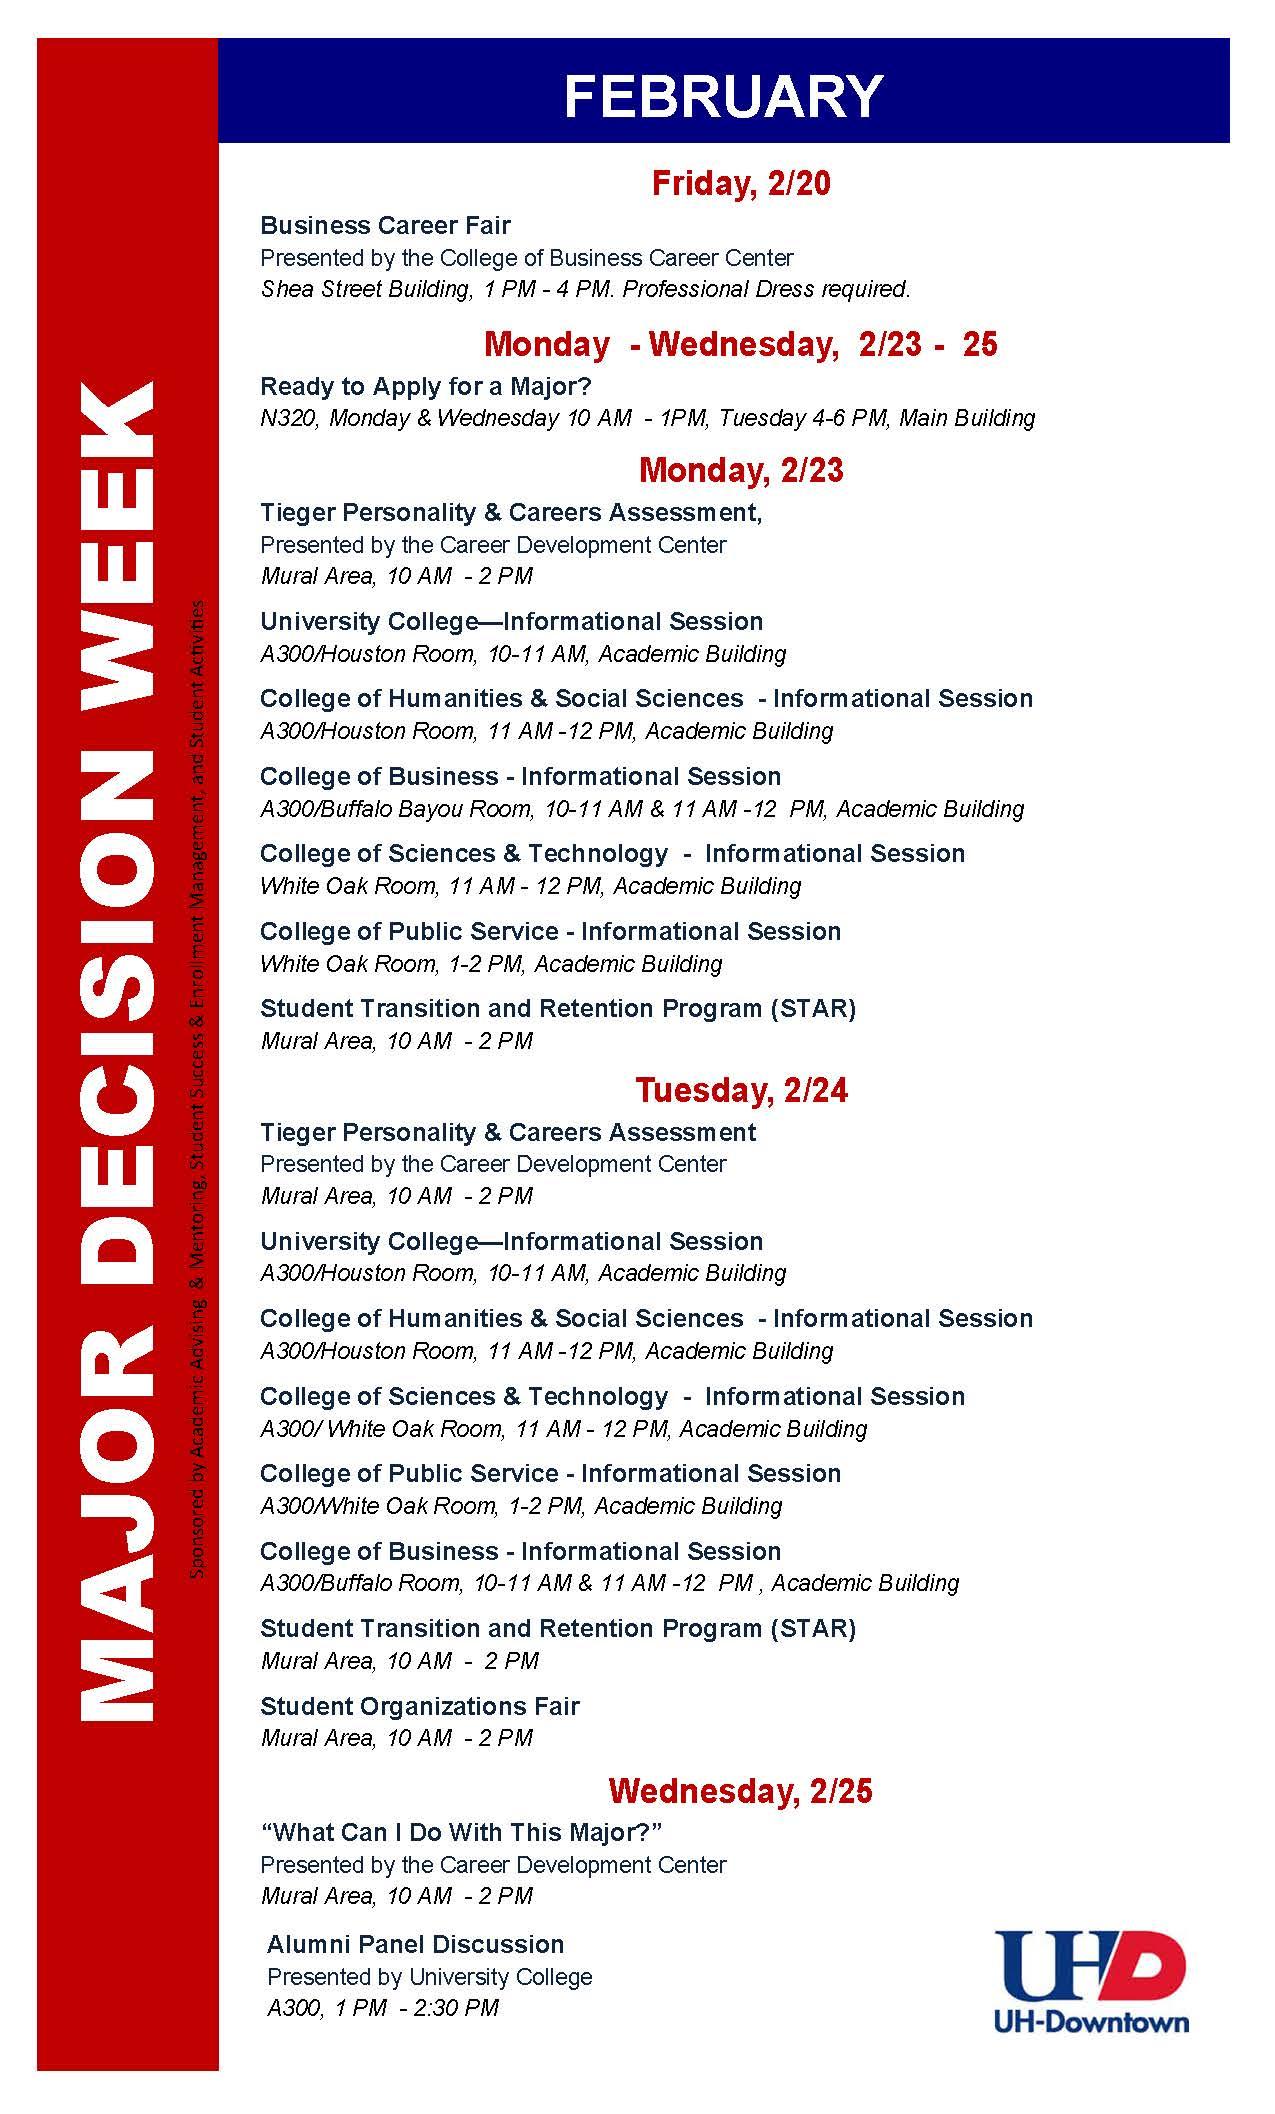 Spring 2015 Major Decision Week